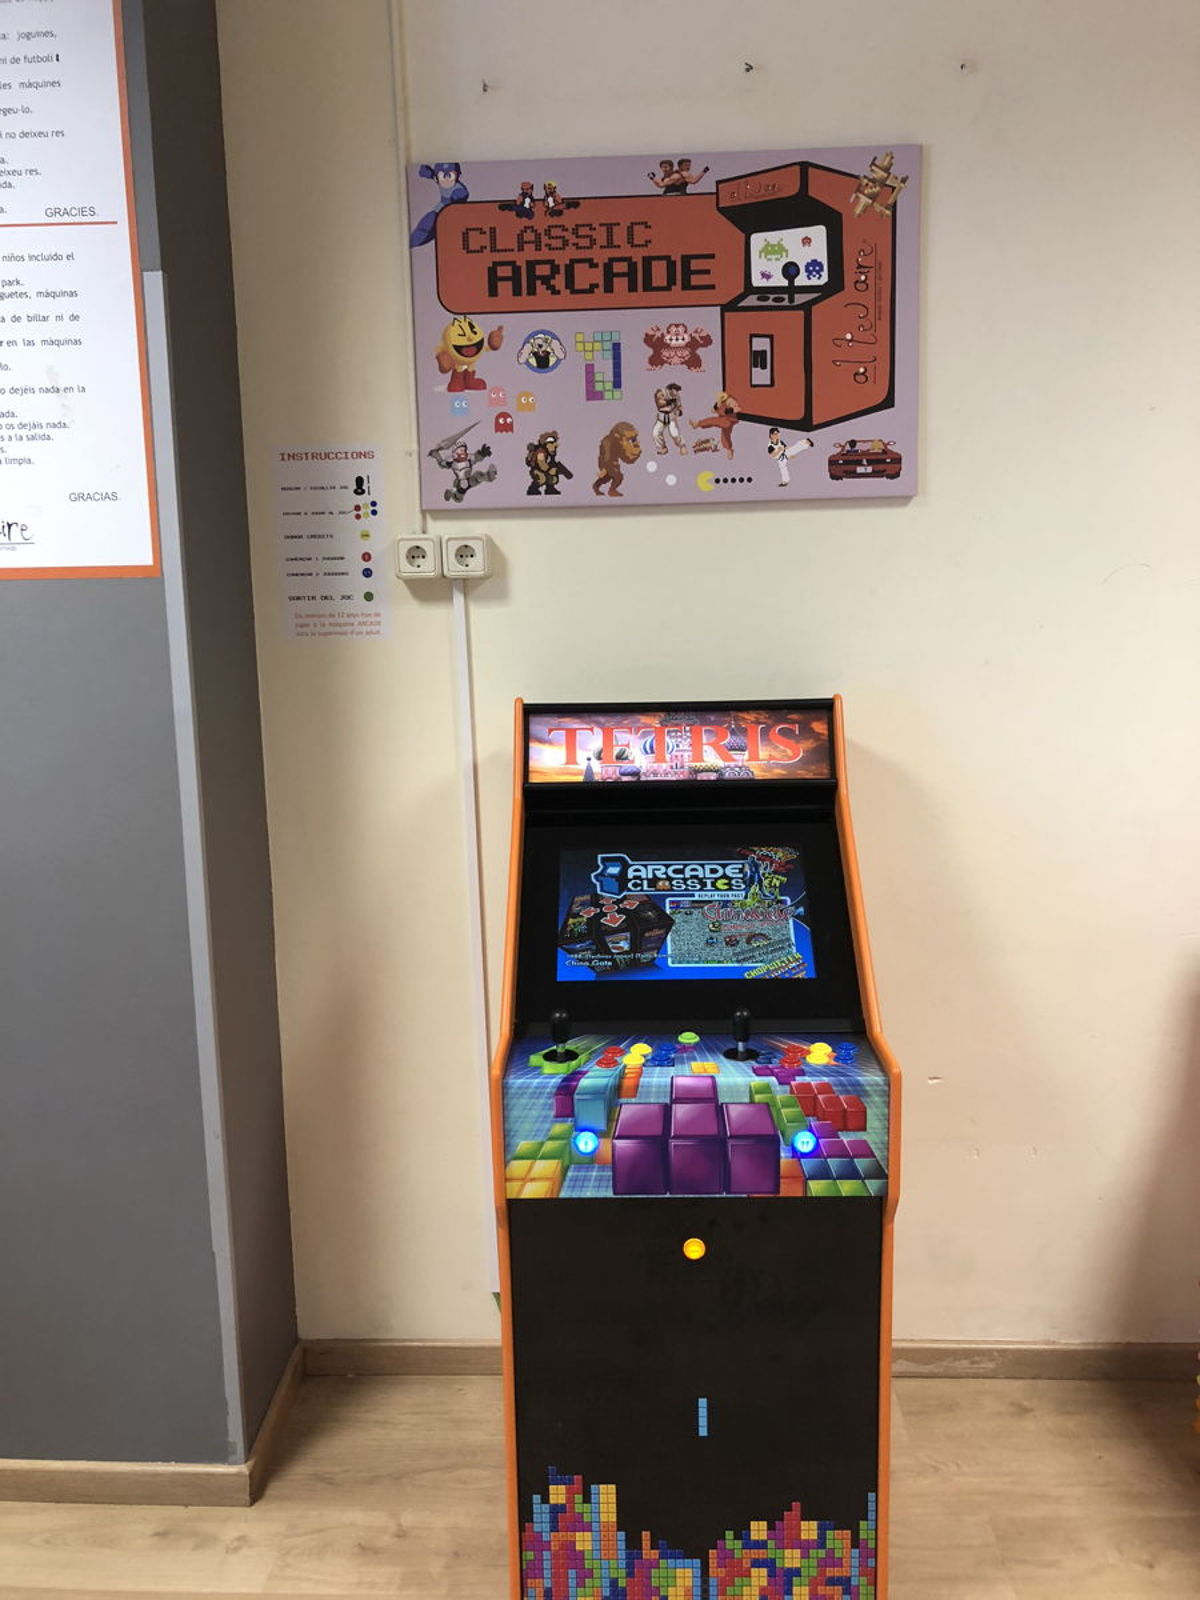 maquina arcade alteuaire sant feliu